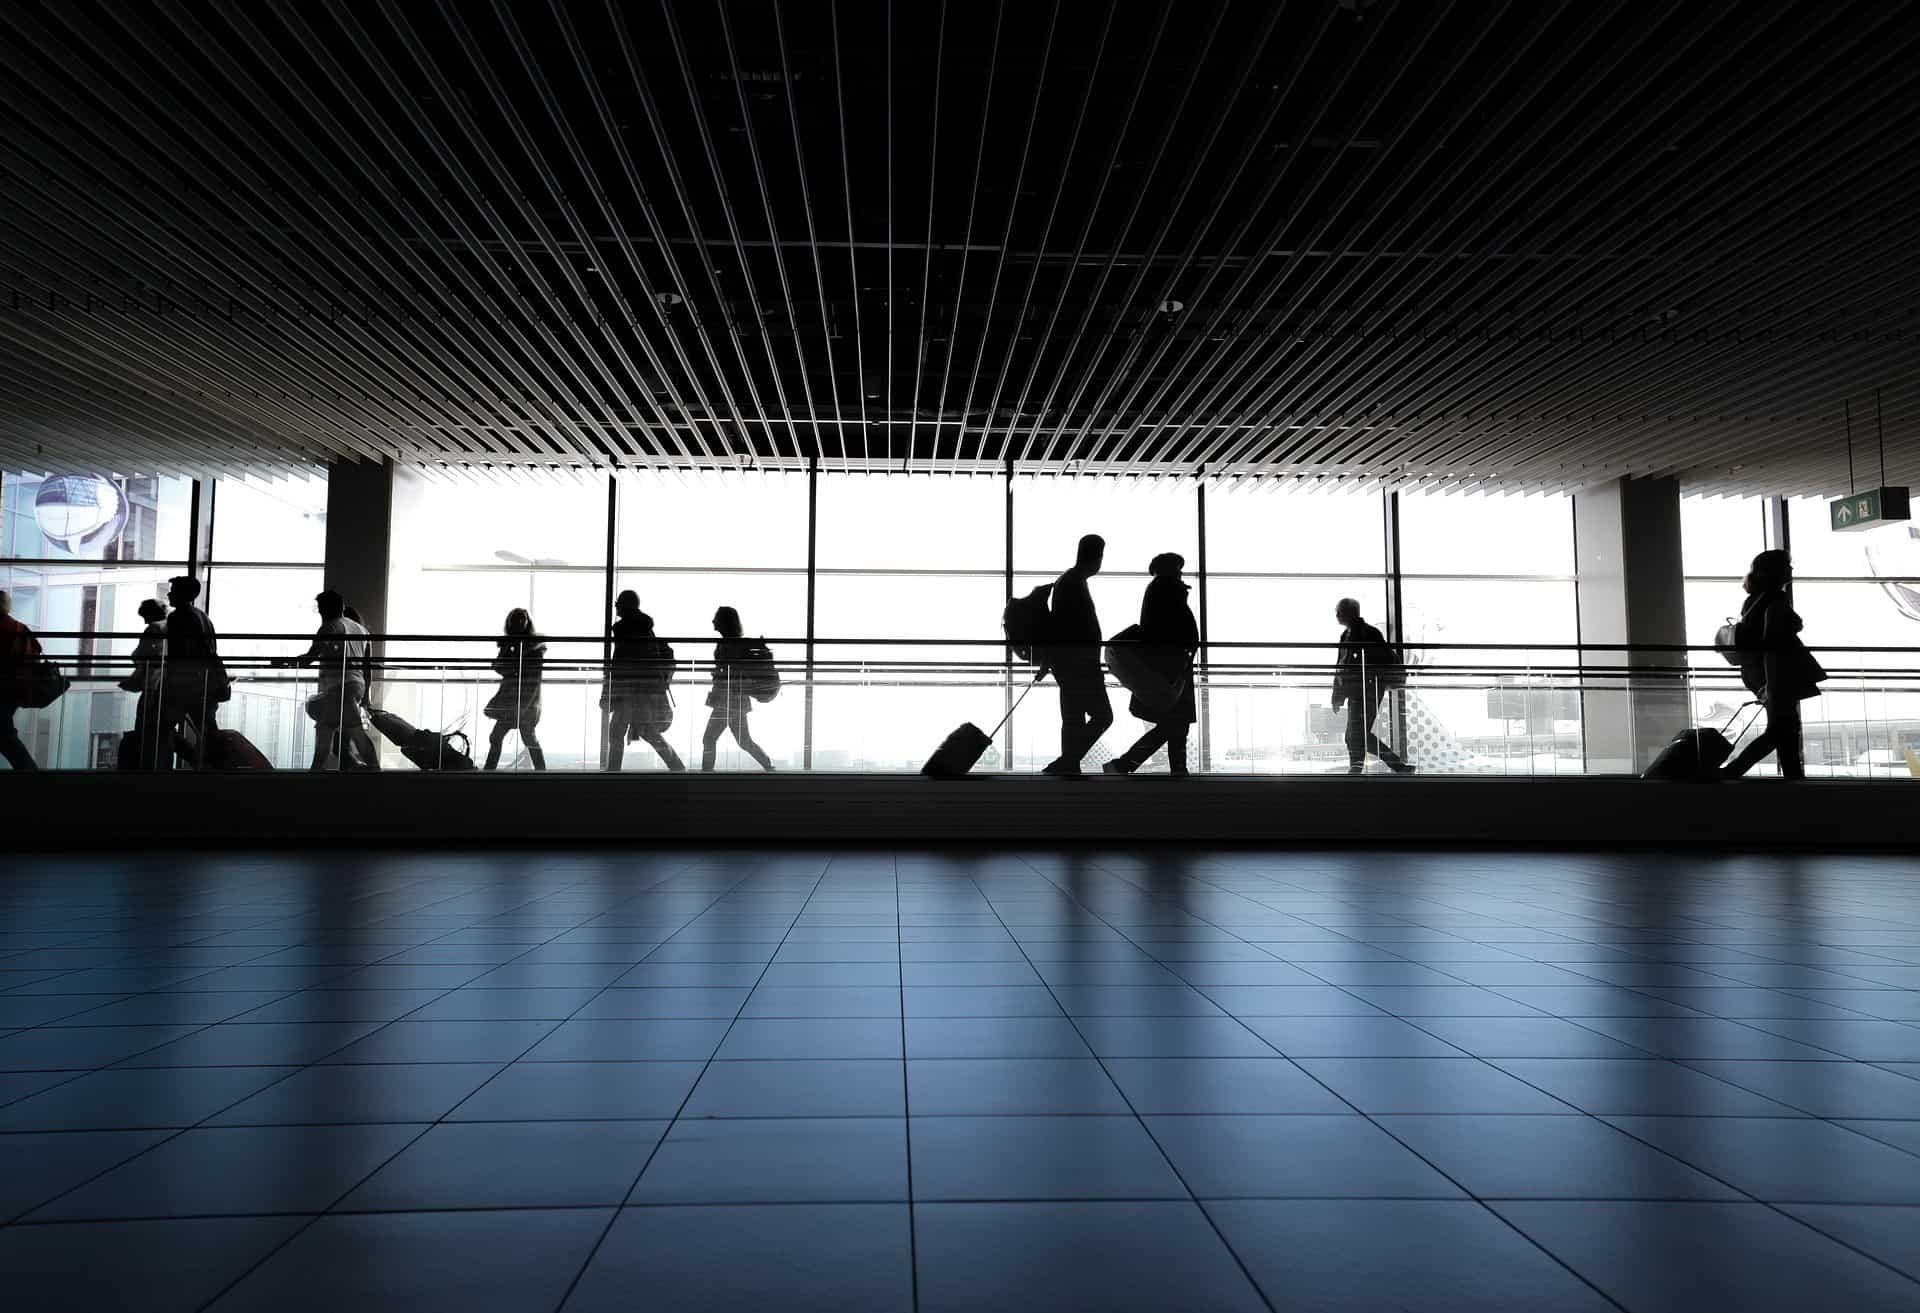 airport sidewalk terminal people pixabay